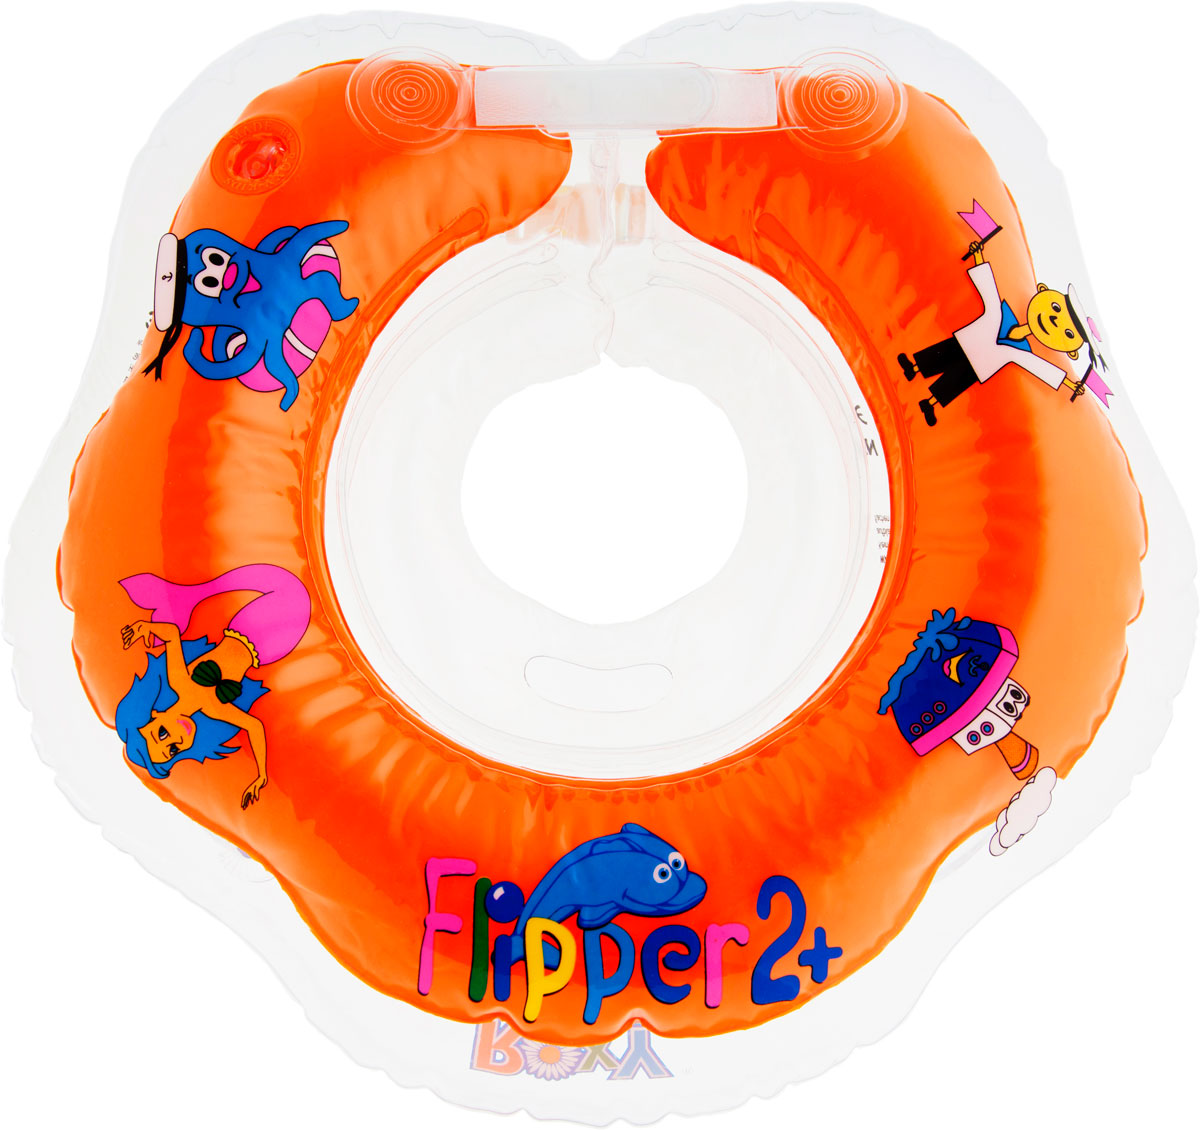 ROXY-KIDS Круг на шею для купания малышей Flipper 2+ roxi kids fl002 круг на шею для купания малышей